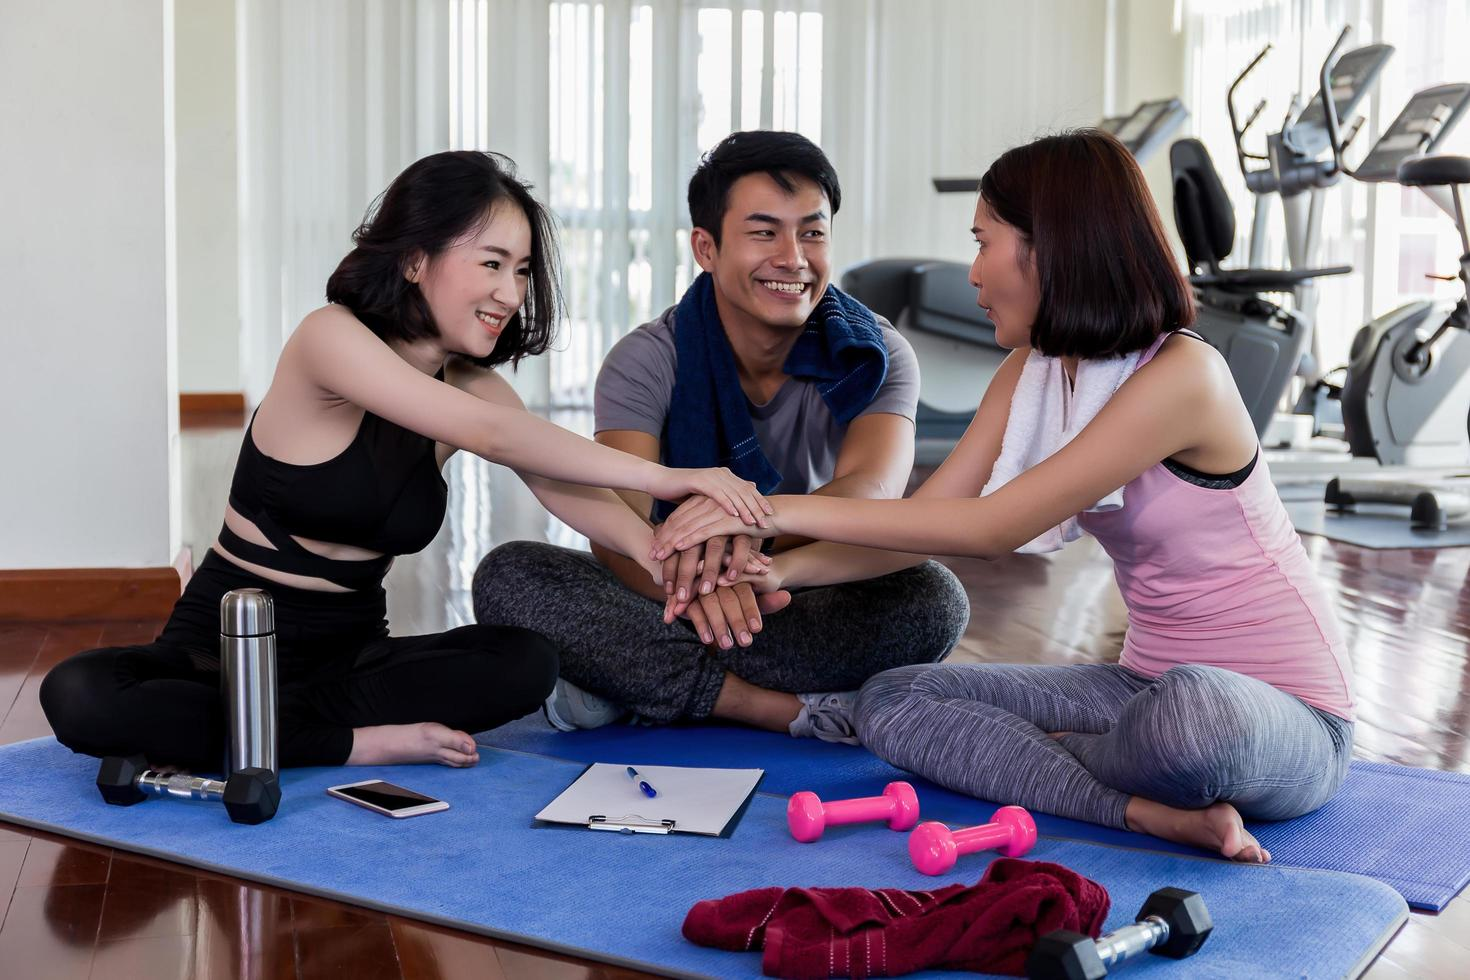 drei Erwachsene im Fitnessstudio foto